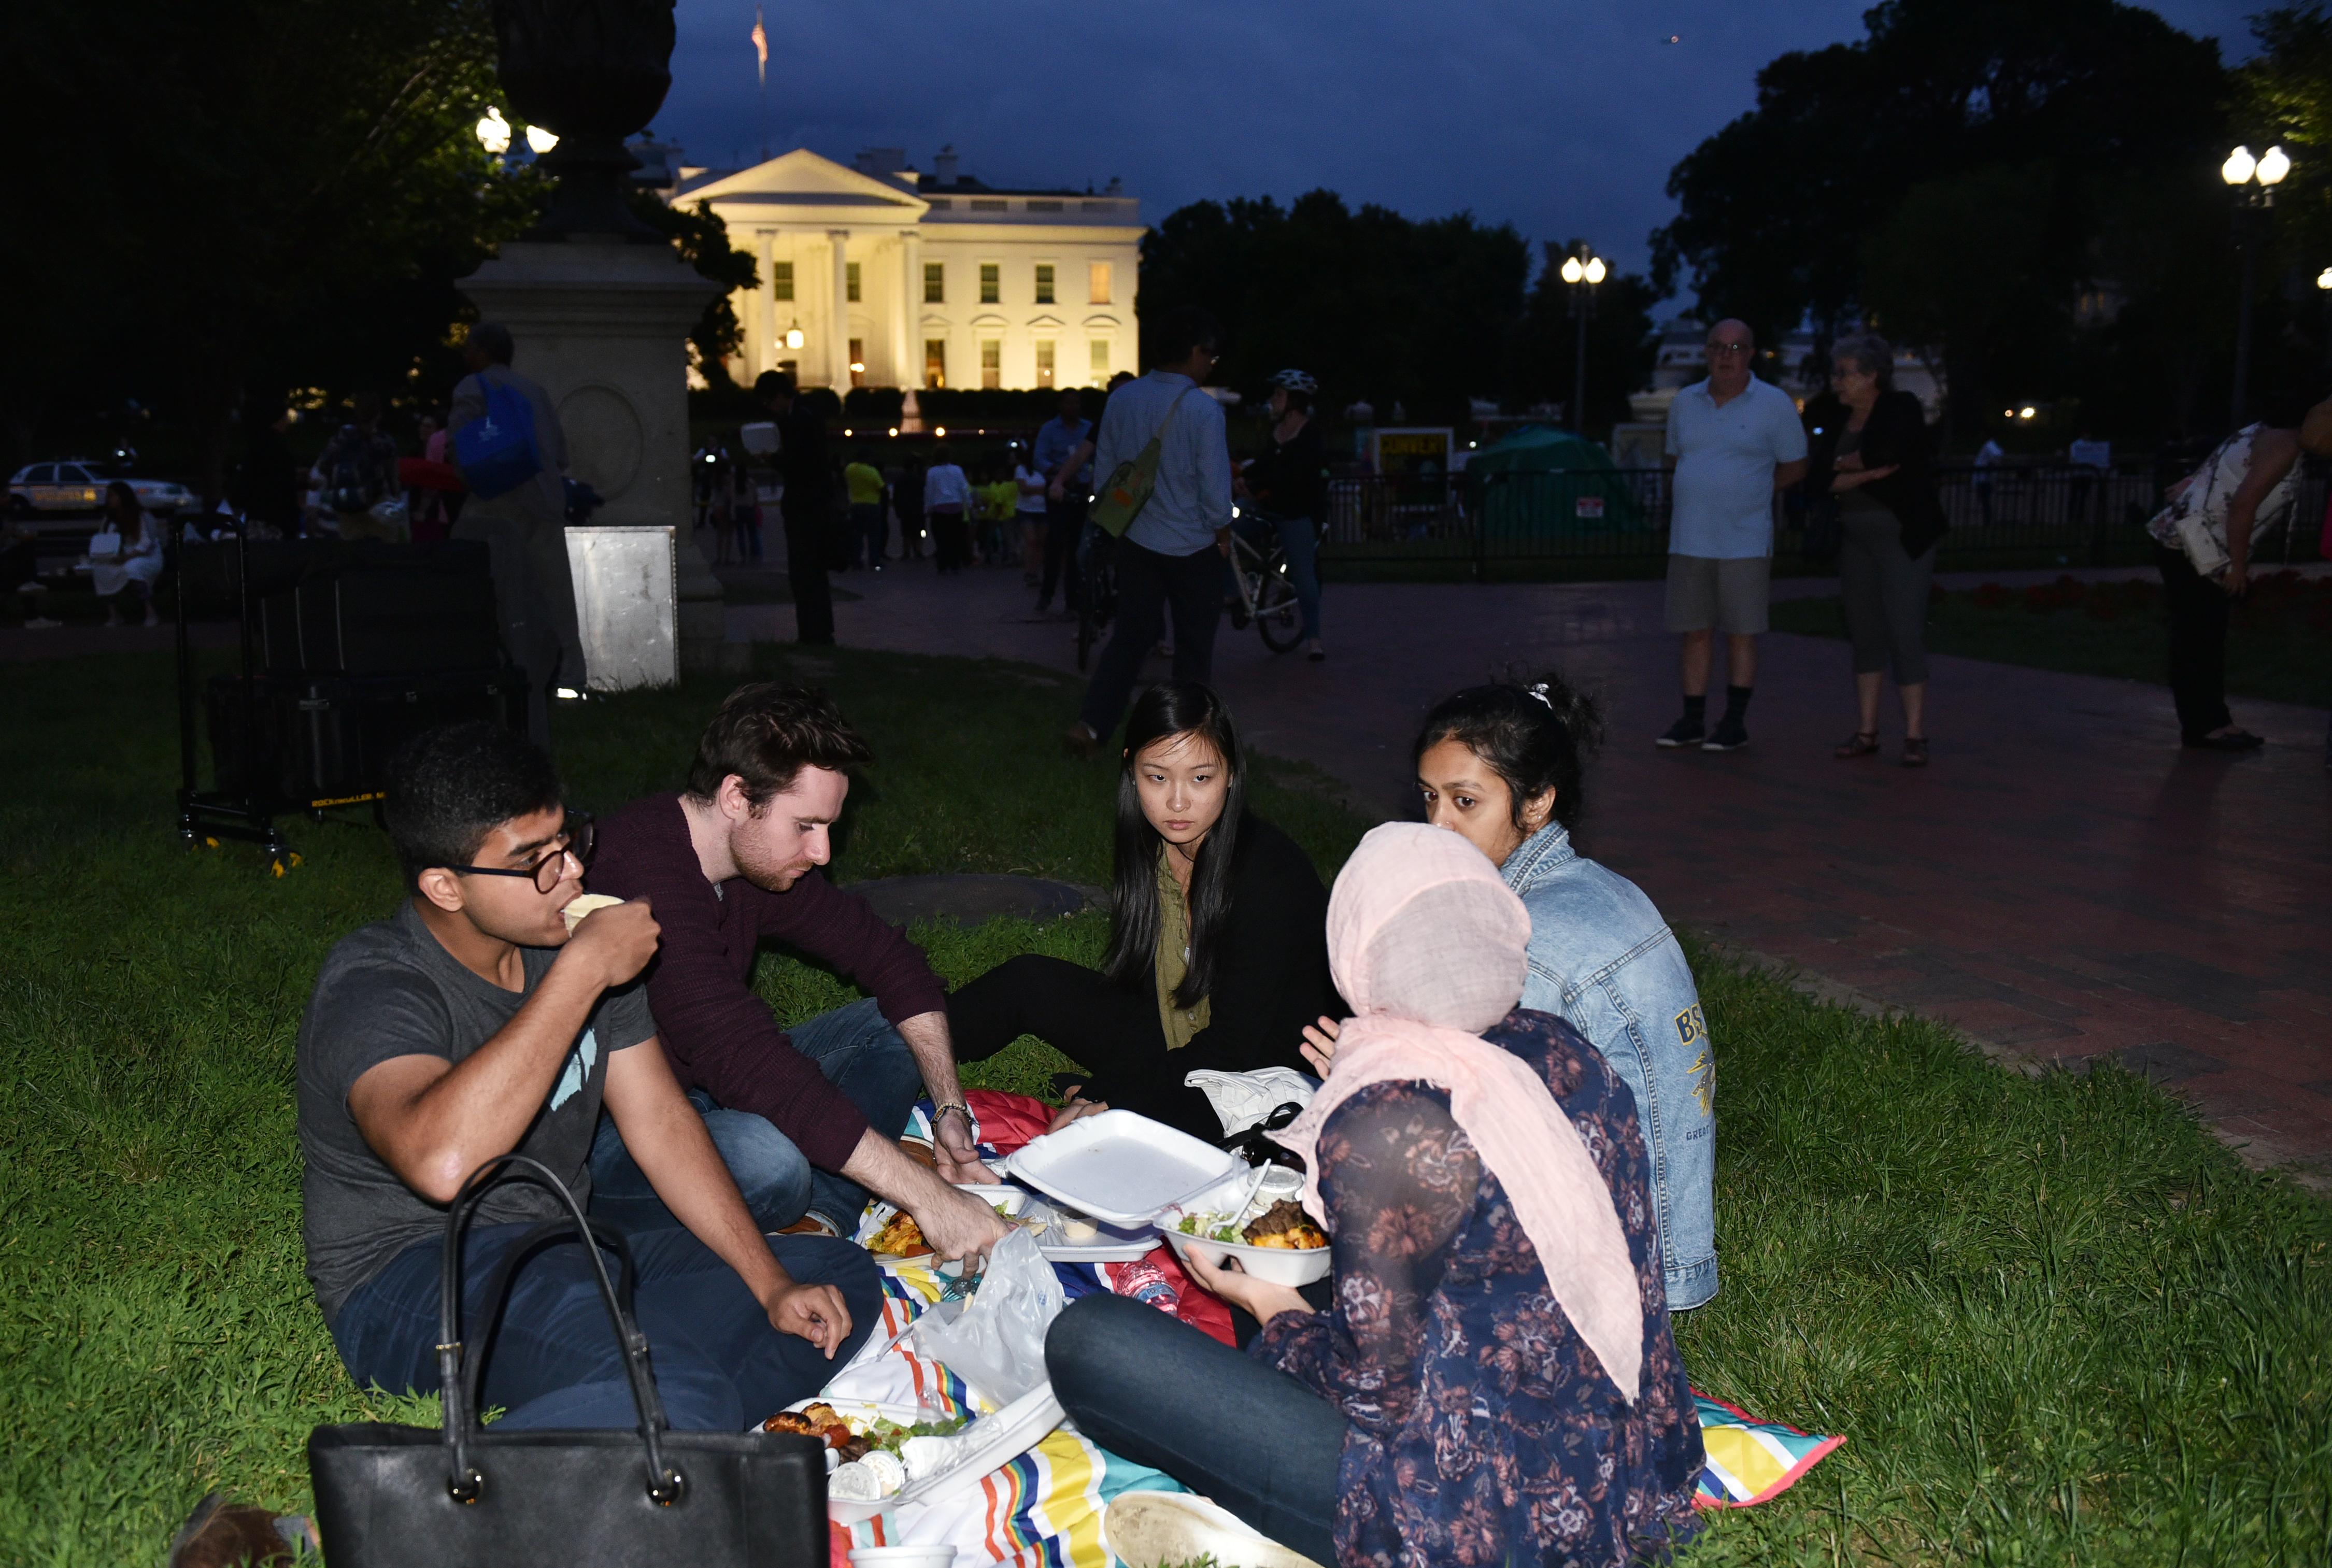 صائمون يتناولون إفطار رمضان في ميدان عام بواشنطن